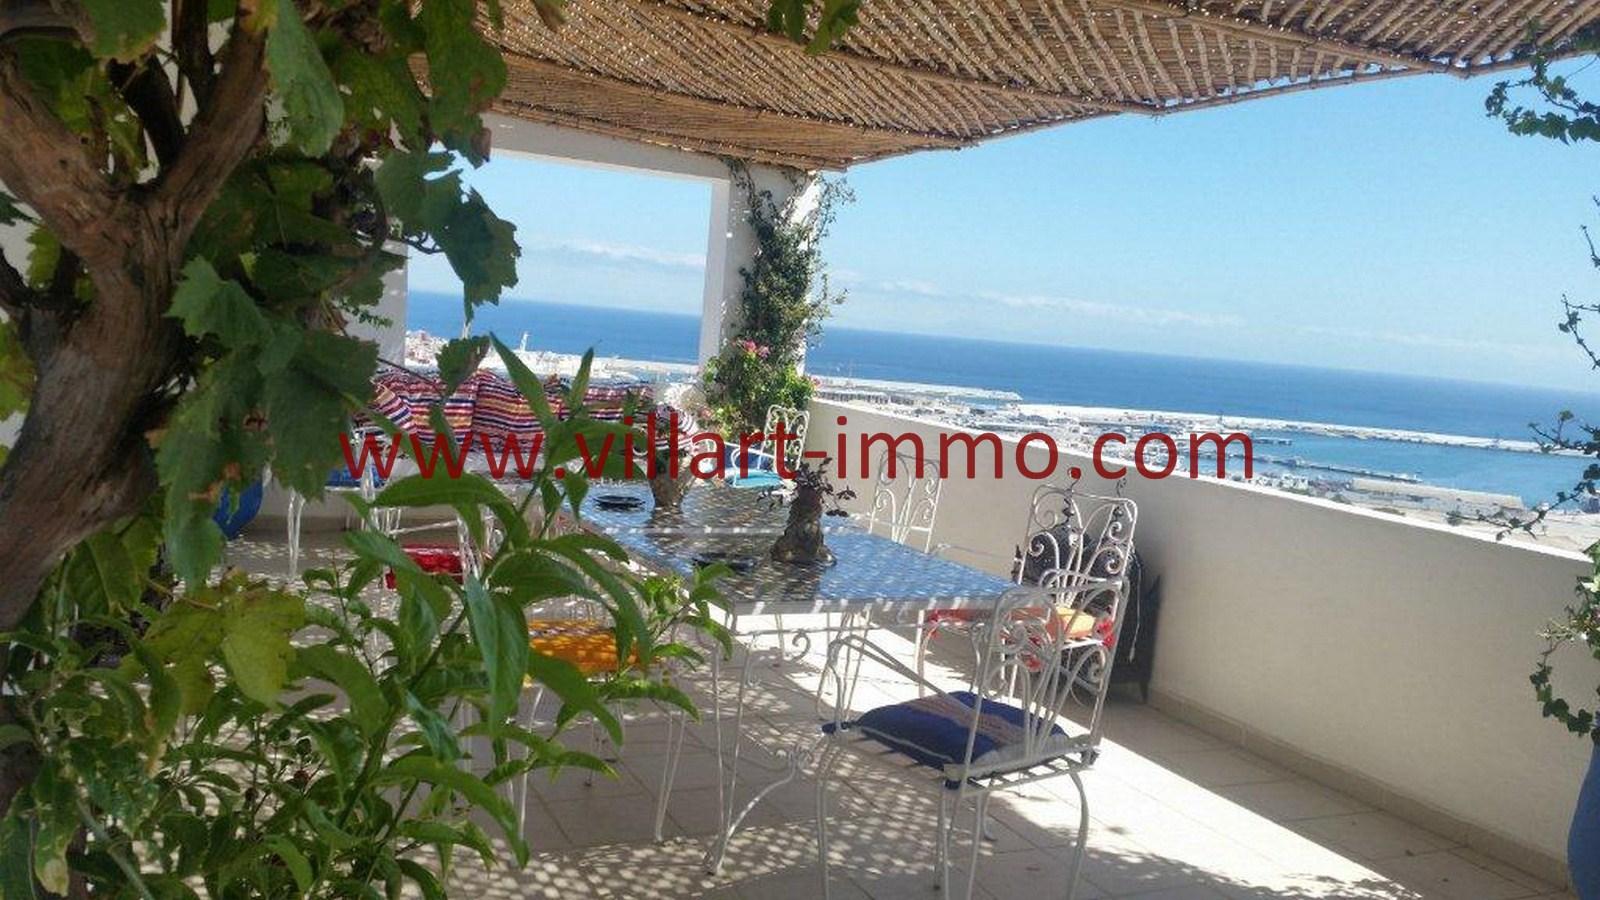 2-Vente-Appartement-Tanger-Centre-De-Ville-Terrasse 2-VA502-Villart Immo